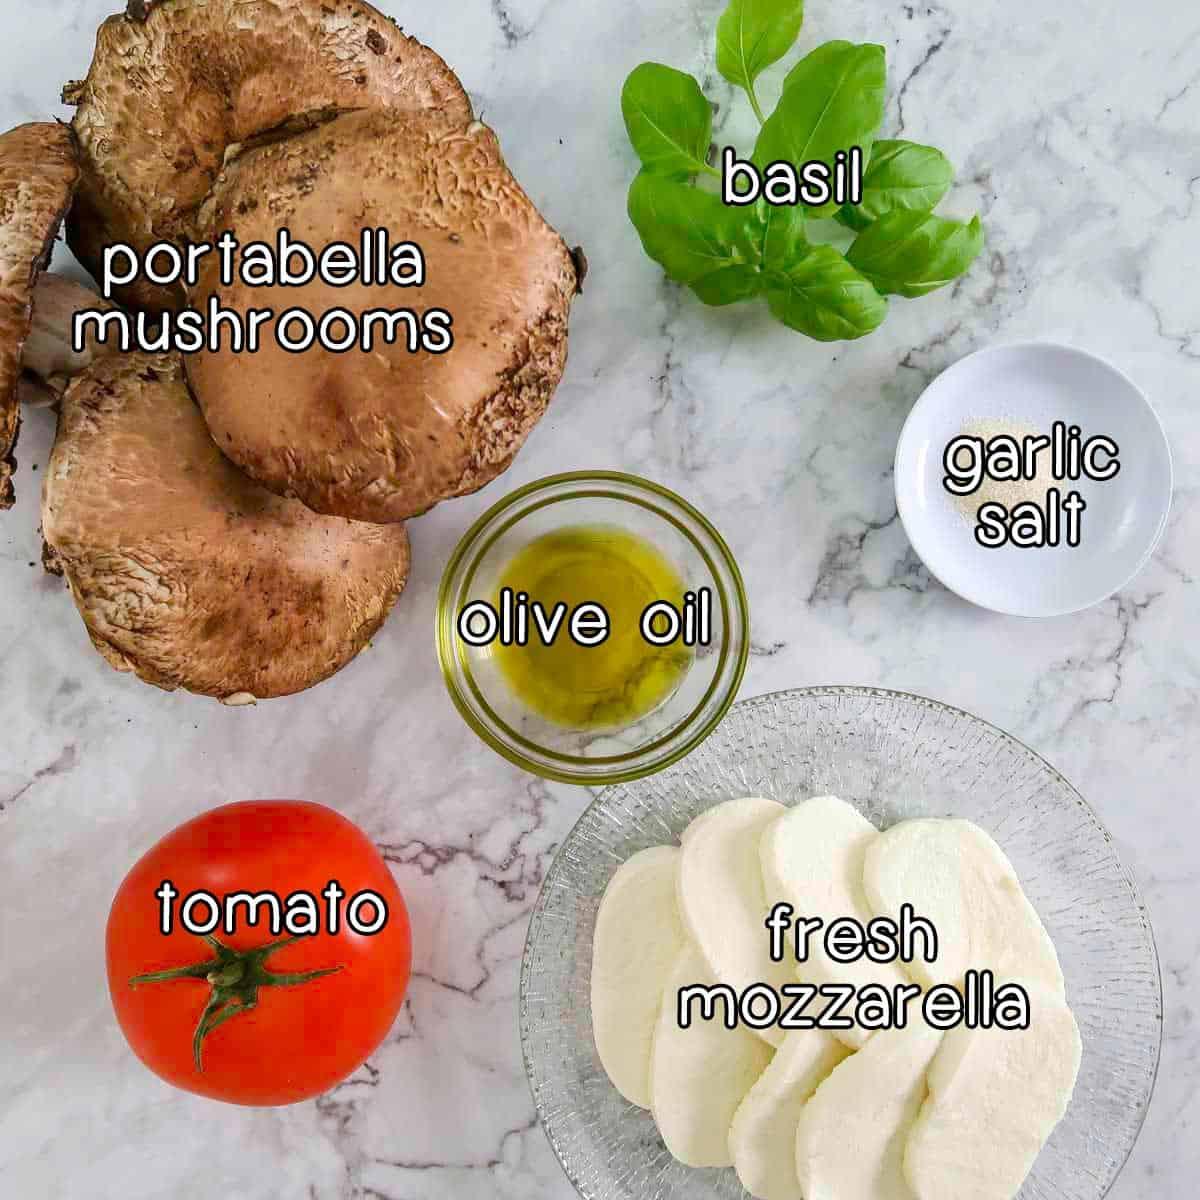 Overhead shot of ingredients- portabella mushrooms, basil, olive oil, garlic salt, tomato, and fresh mozzarella.